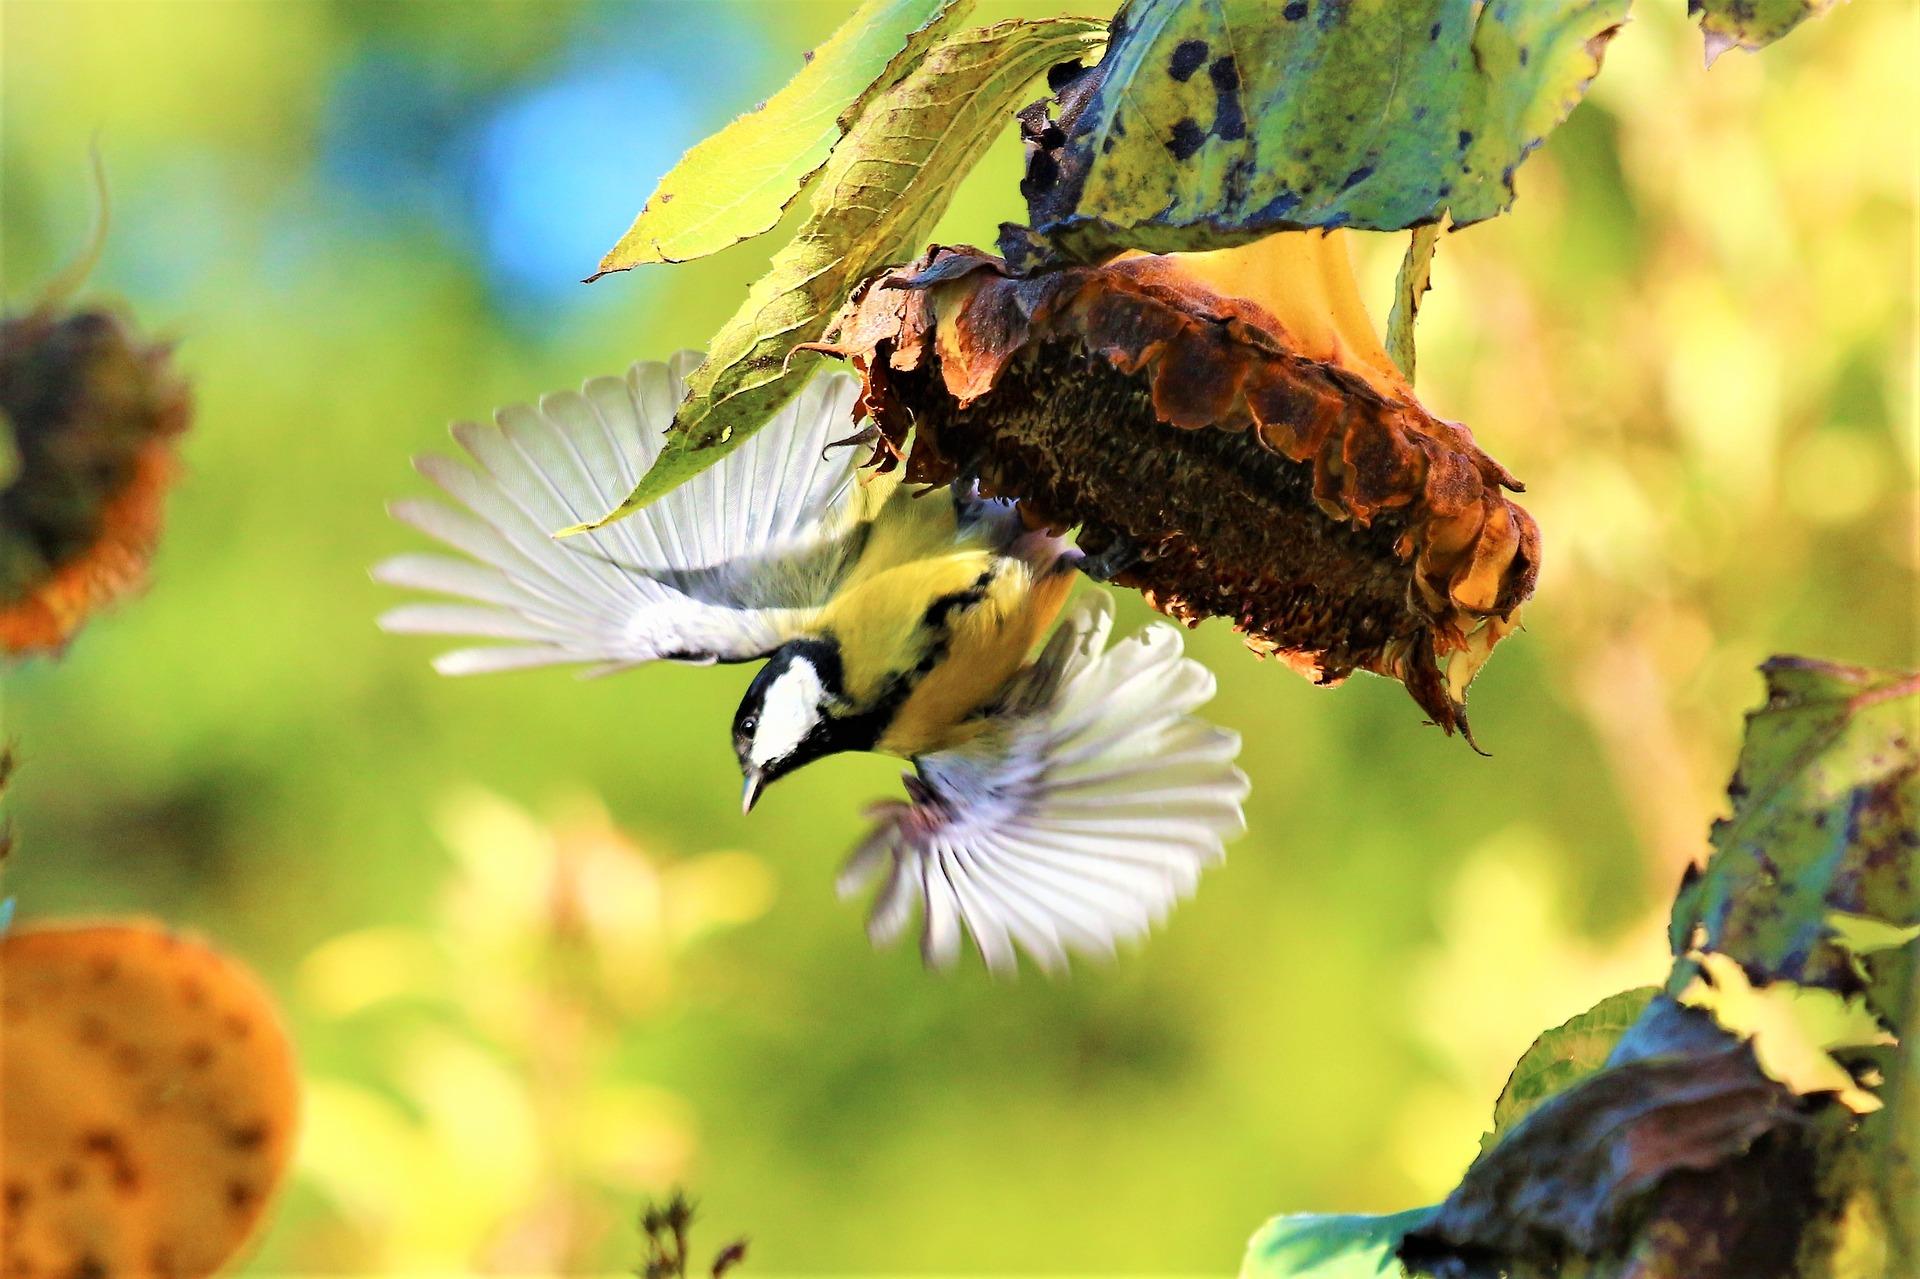 bird-2854442_1920.jpg